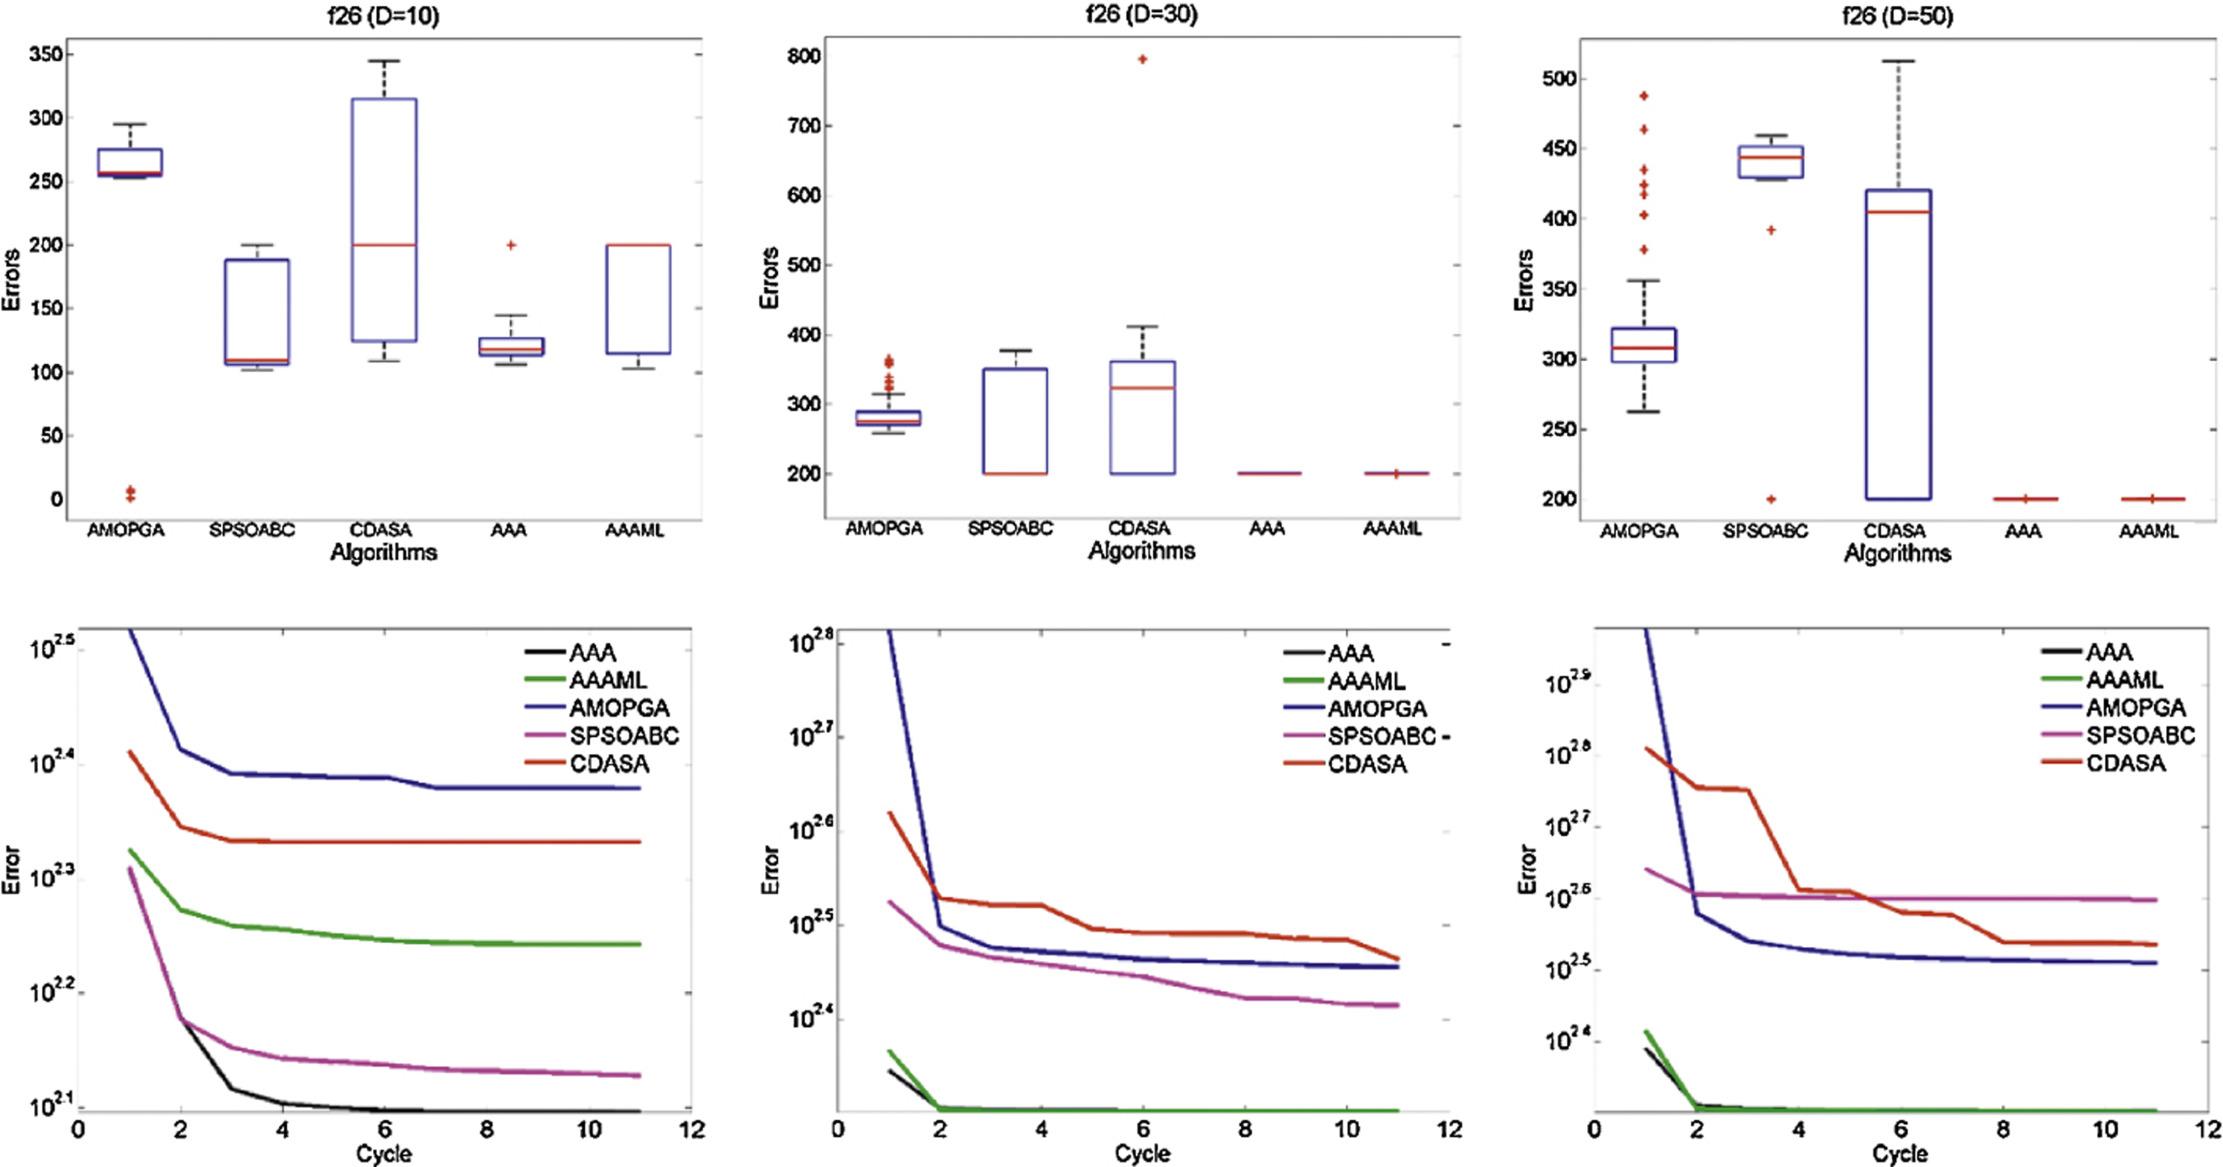 Artificial algae algorithm with multi-light source for numerical